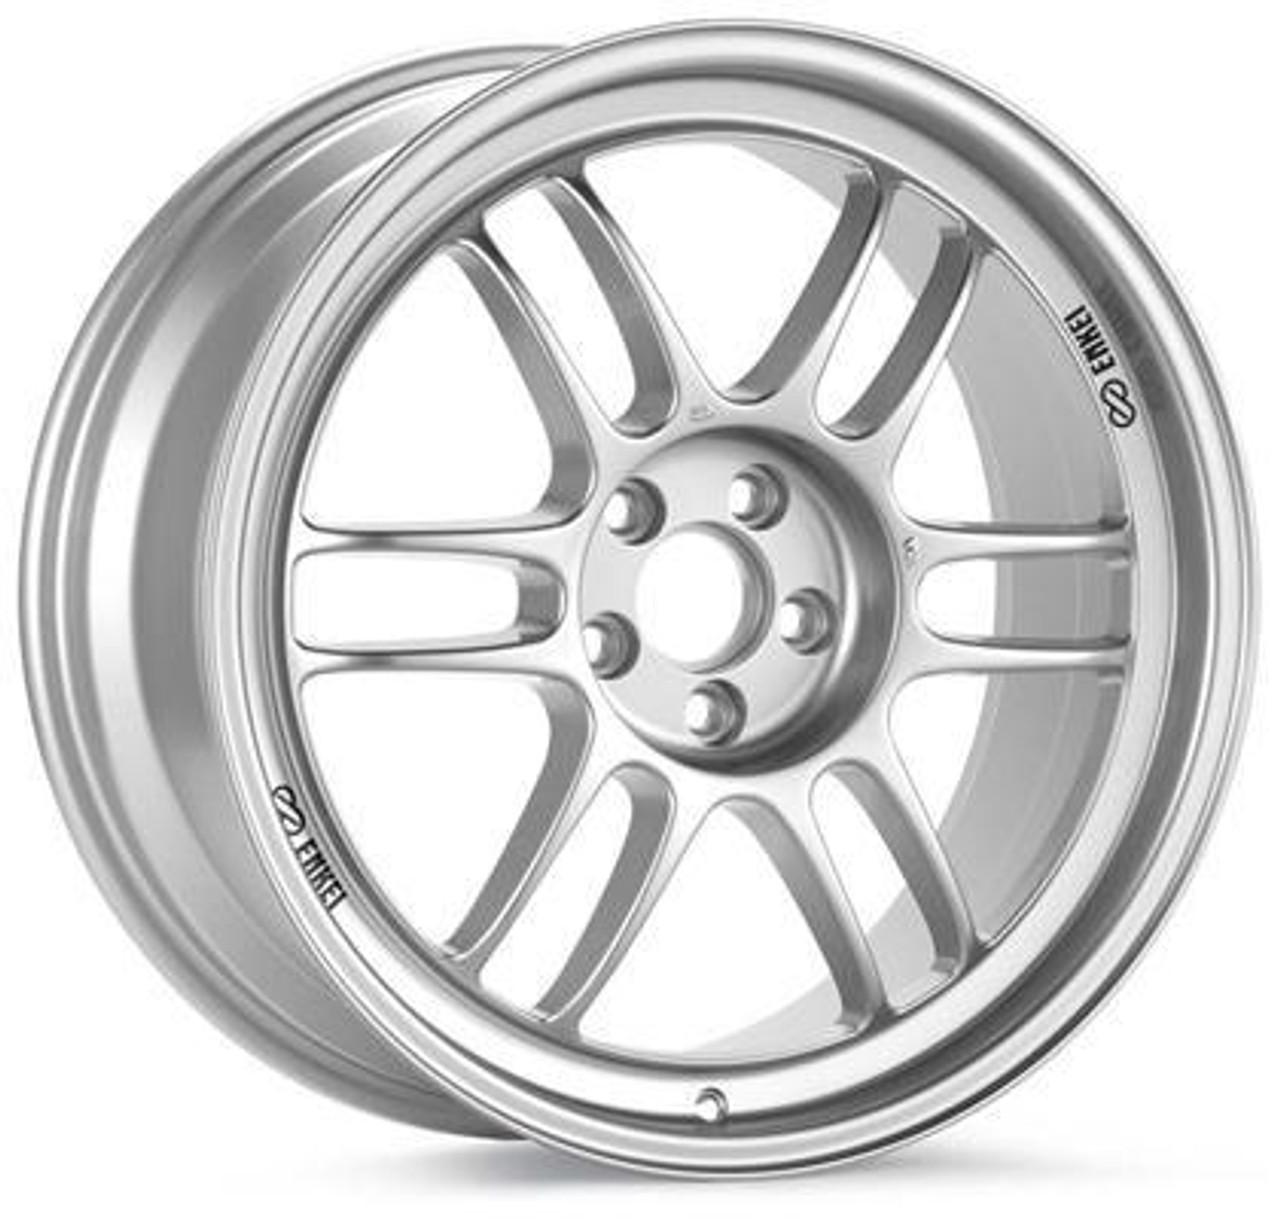 RPF1 Wheels